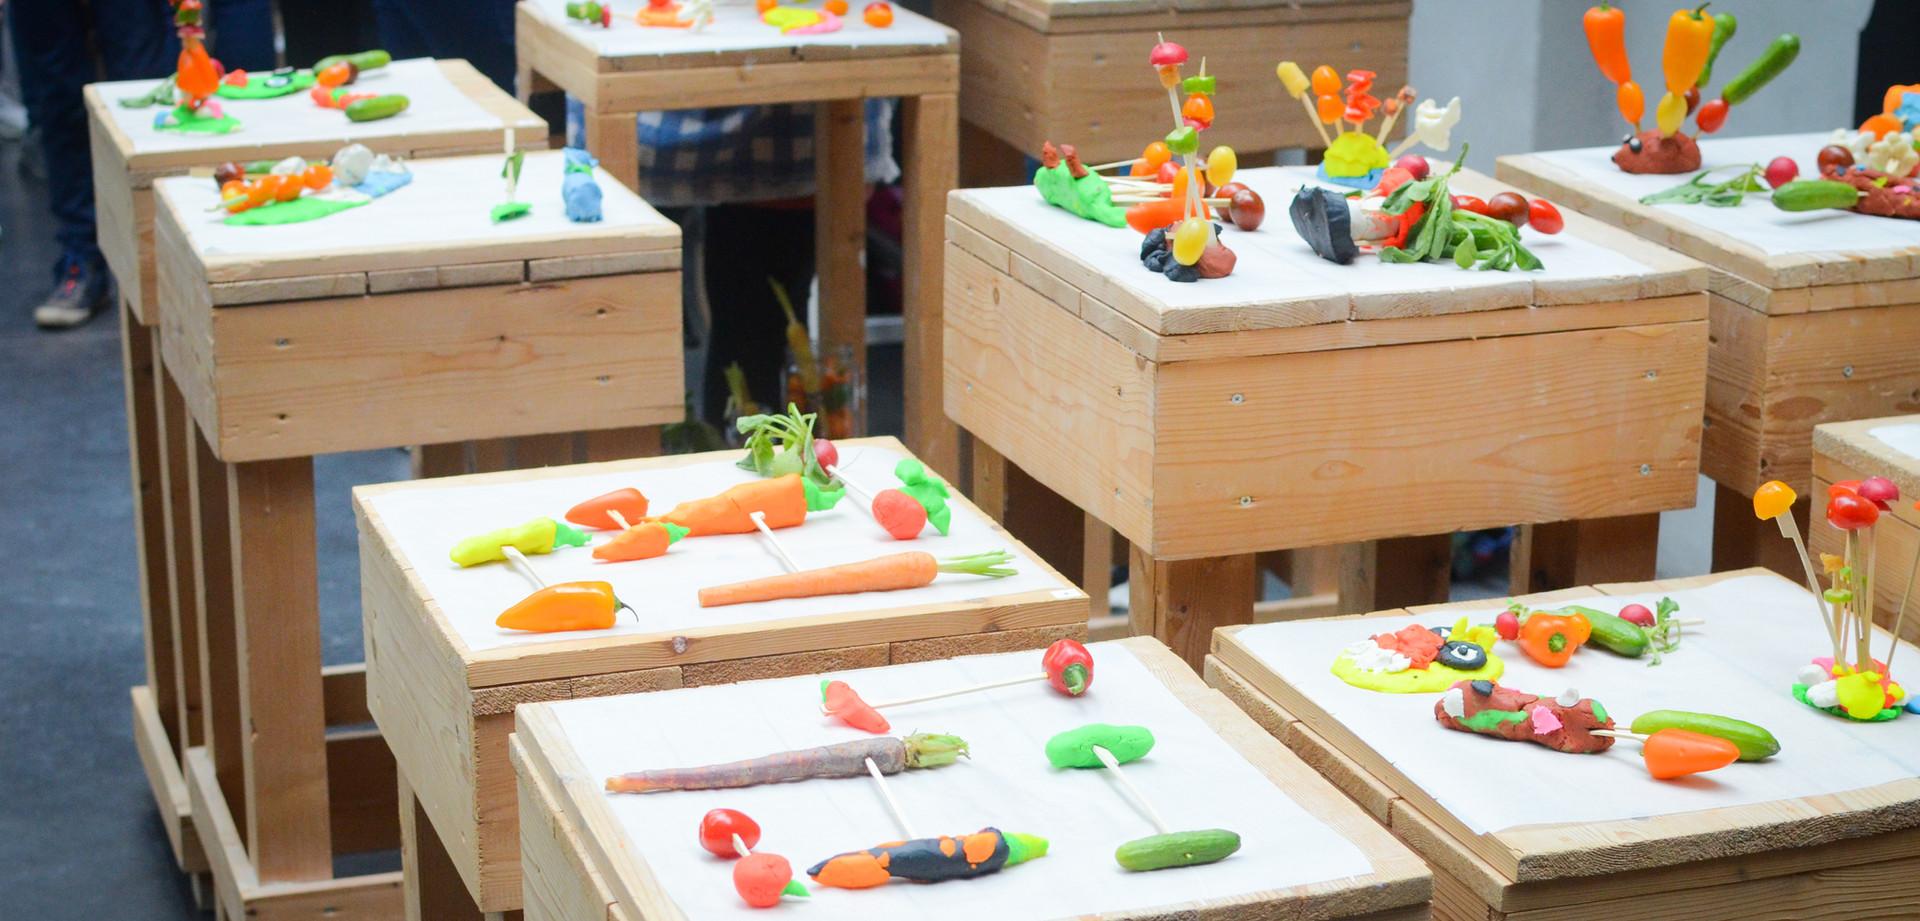 Groentekunstwerkjes Kinderkunstcongres foto: Lotte Bosma - Méér Muziek in de Klas